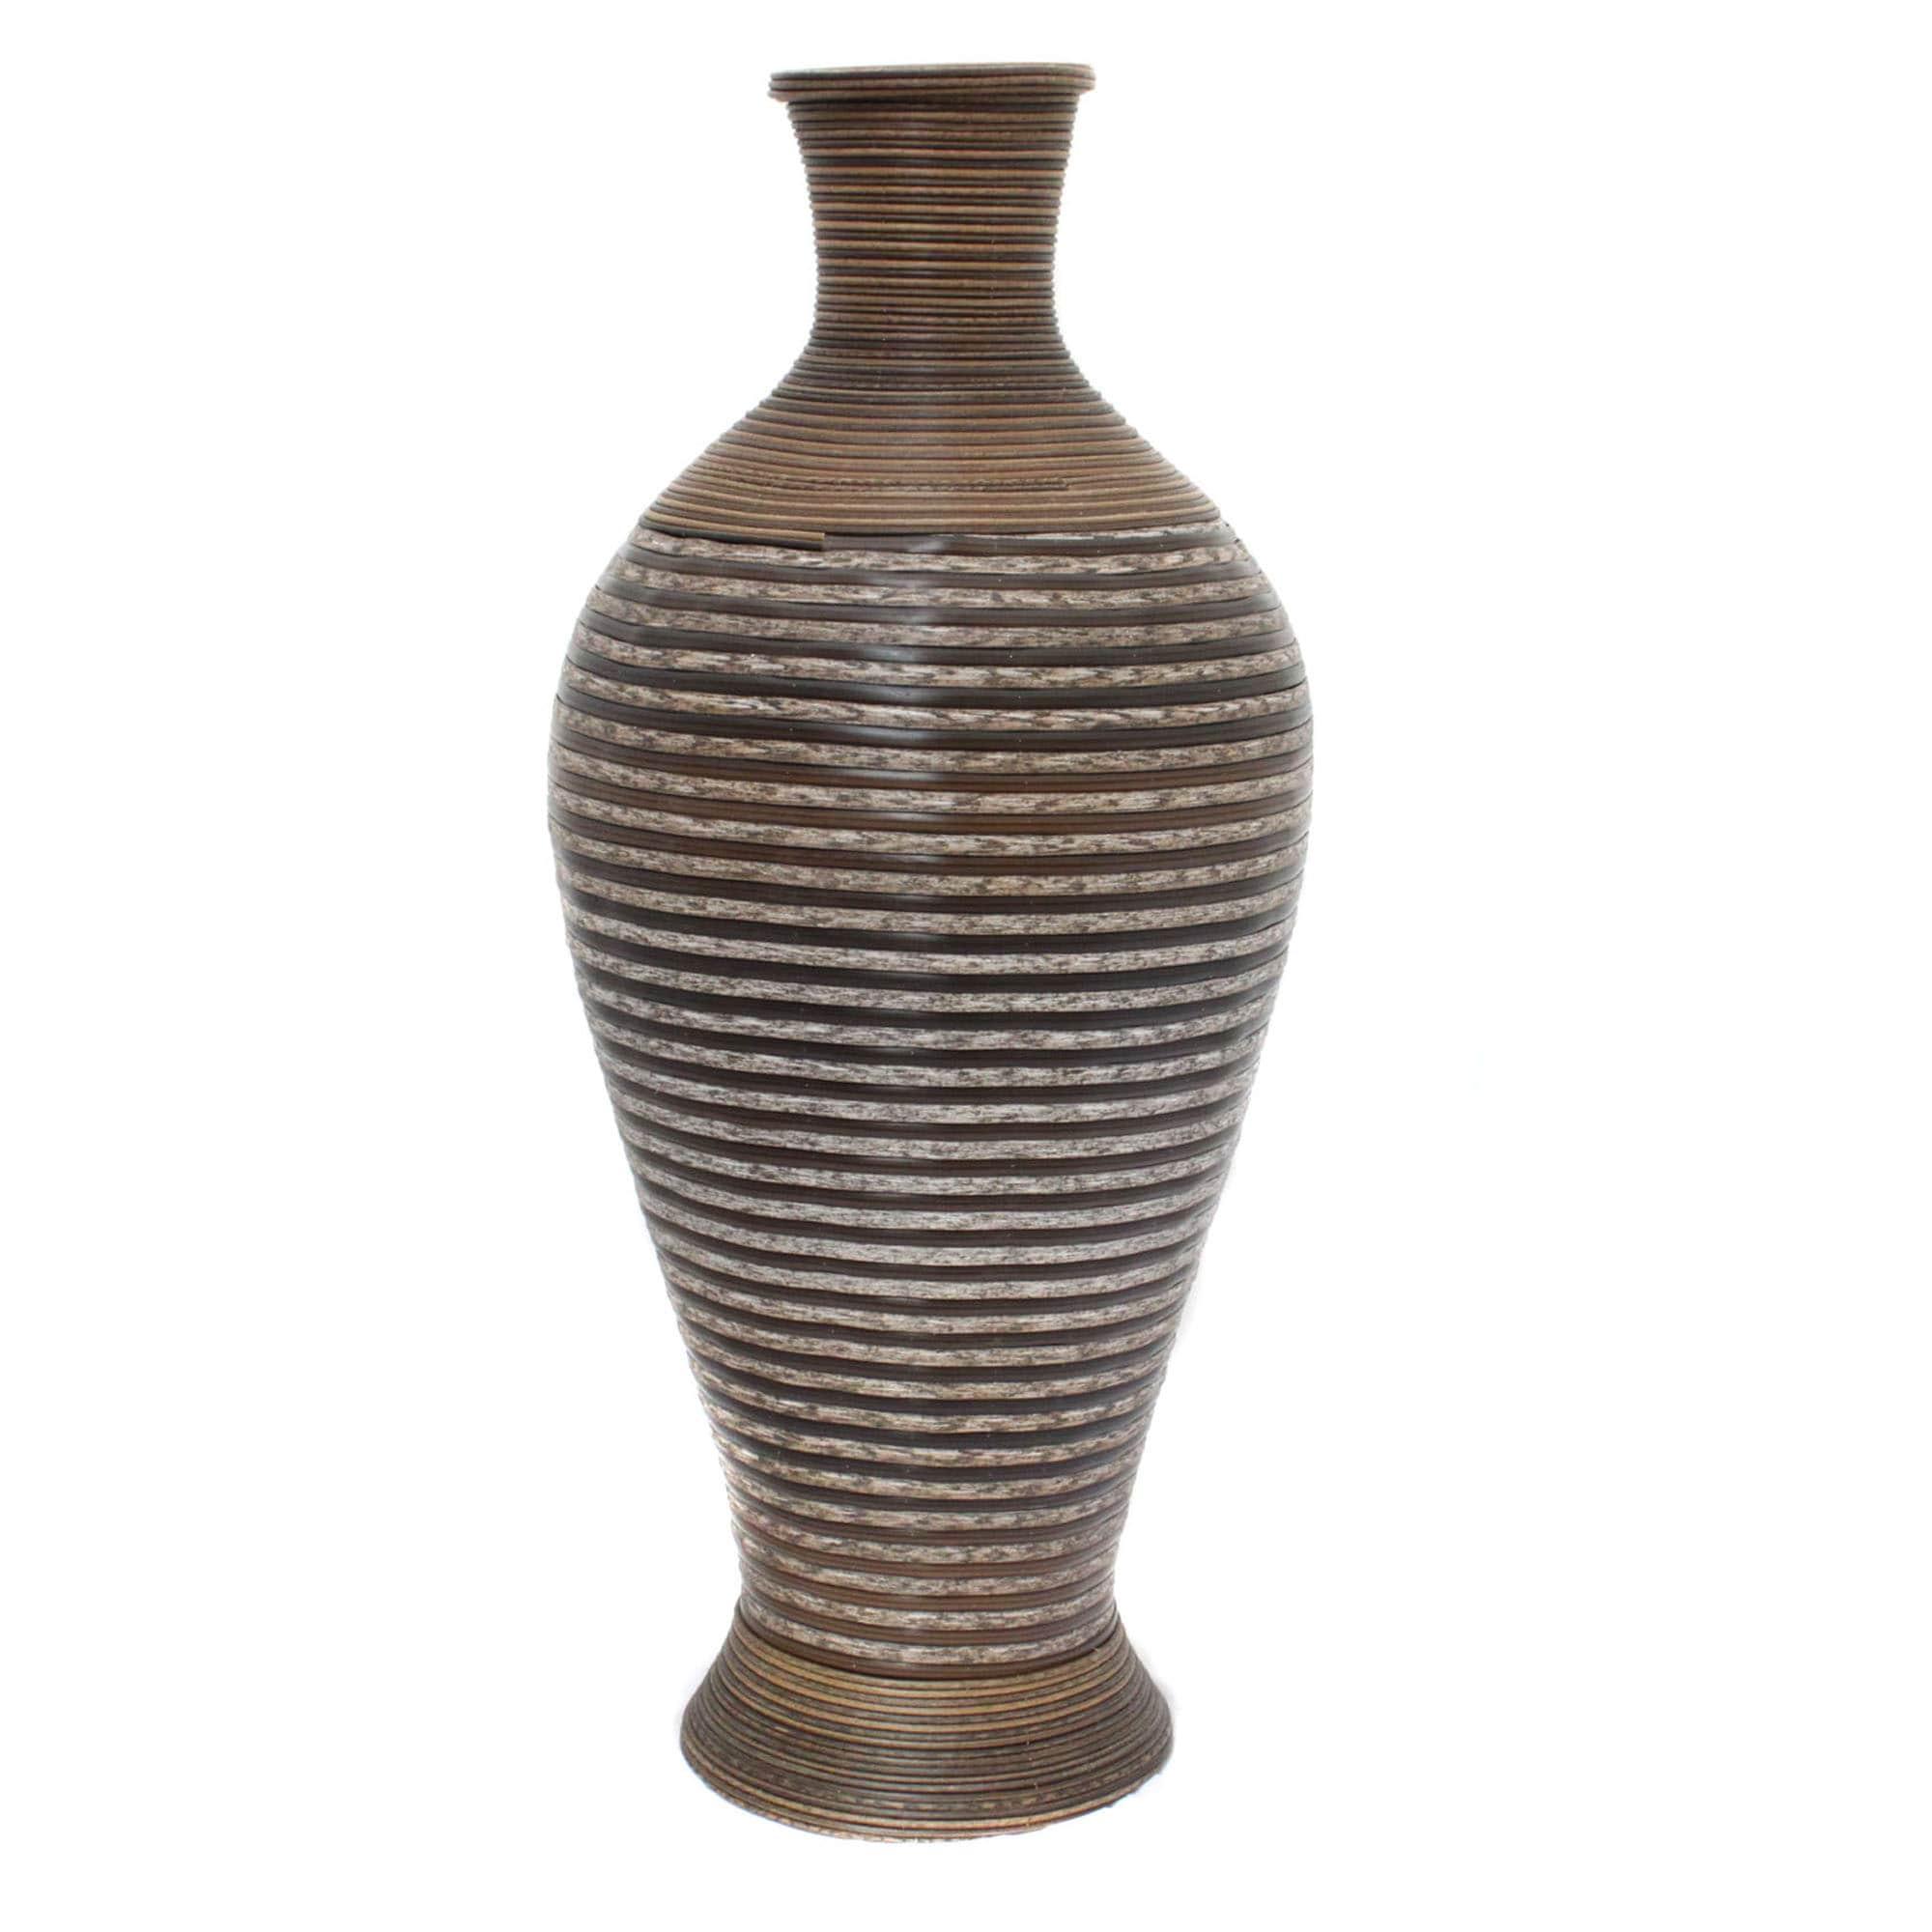 Casa Cortes Artisian Large Rattan Vase